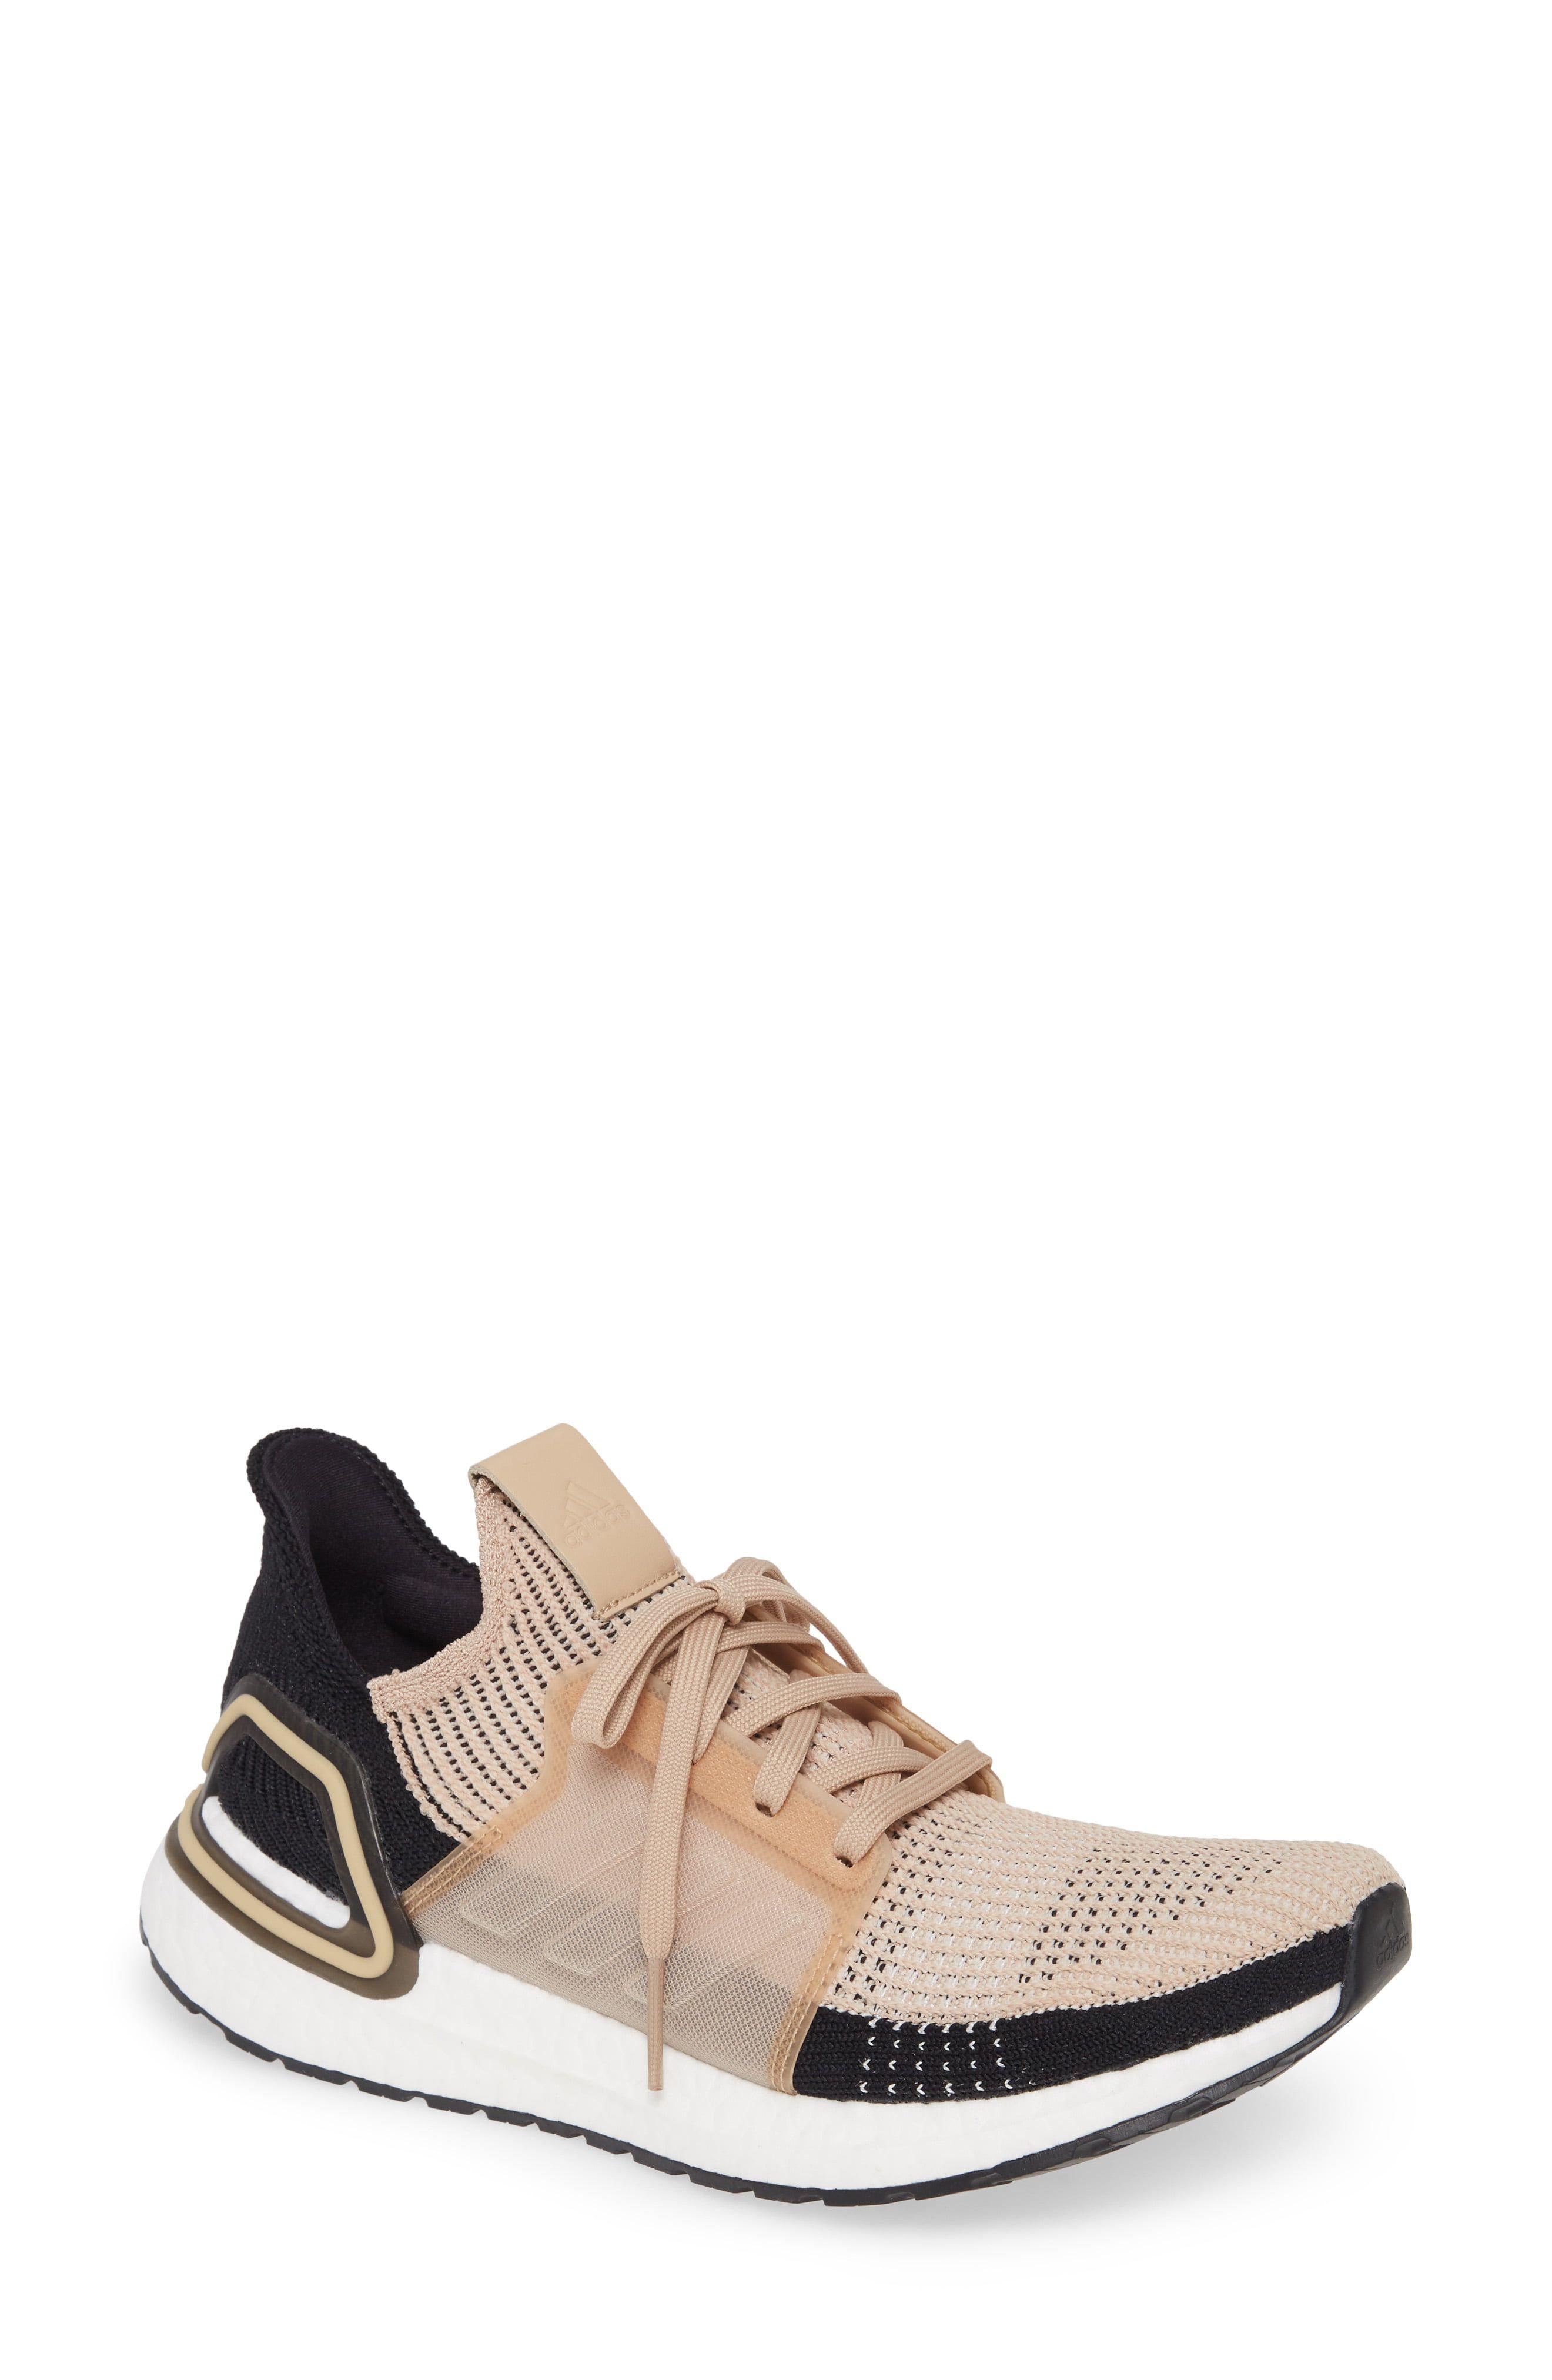 Adidas Ultraboost 19 Running Shoe, Size